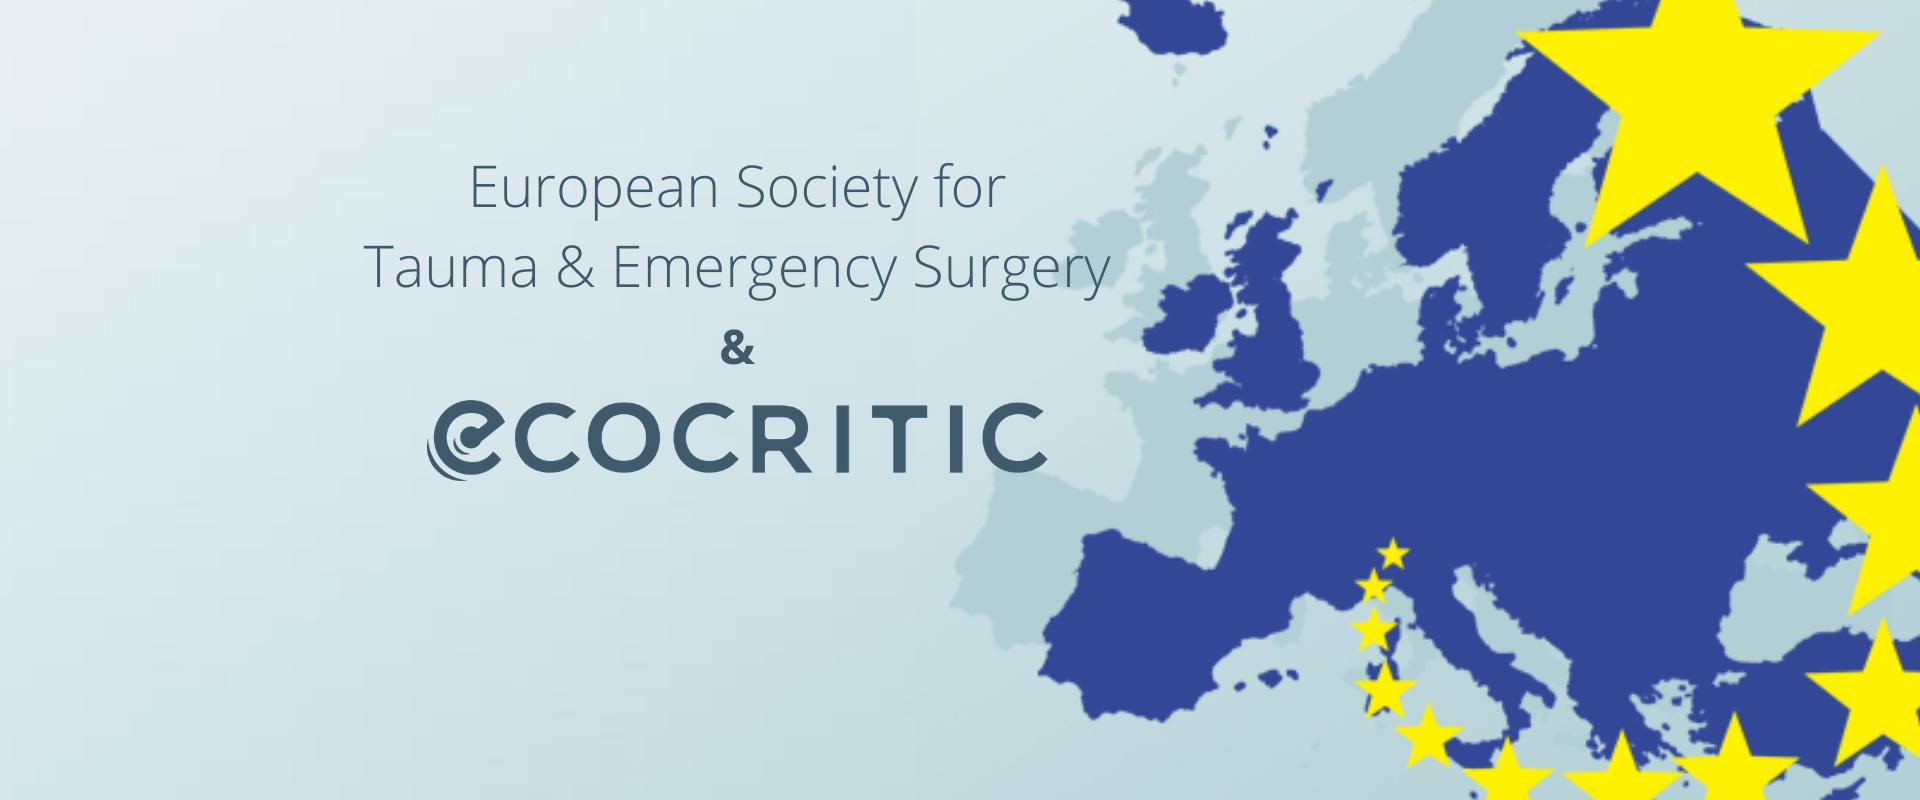 European Society for Tauma & Emergency Surgery & ECOCRITIC